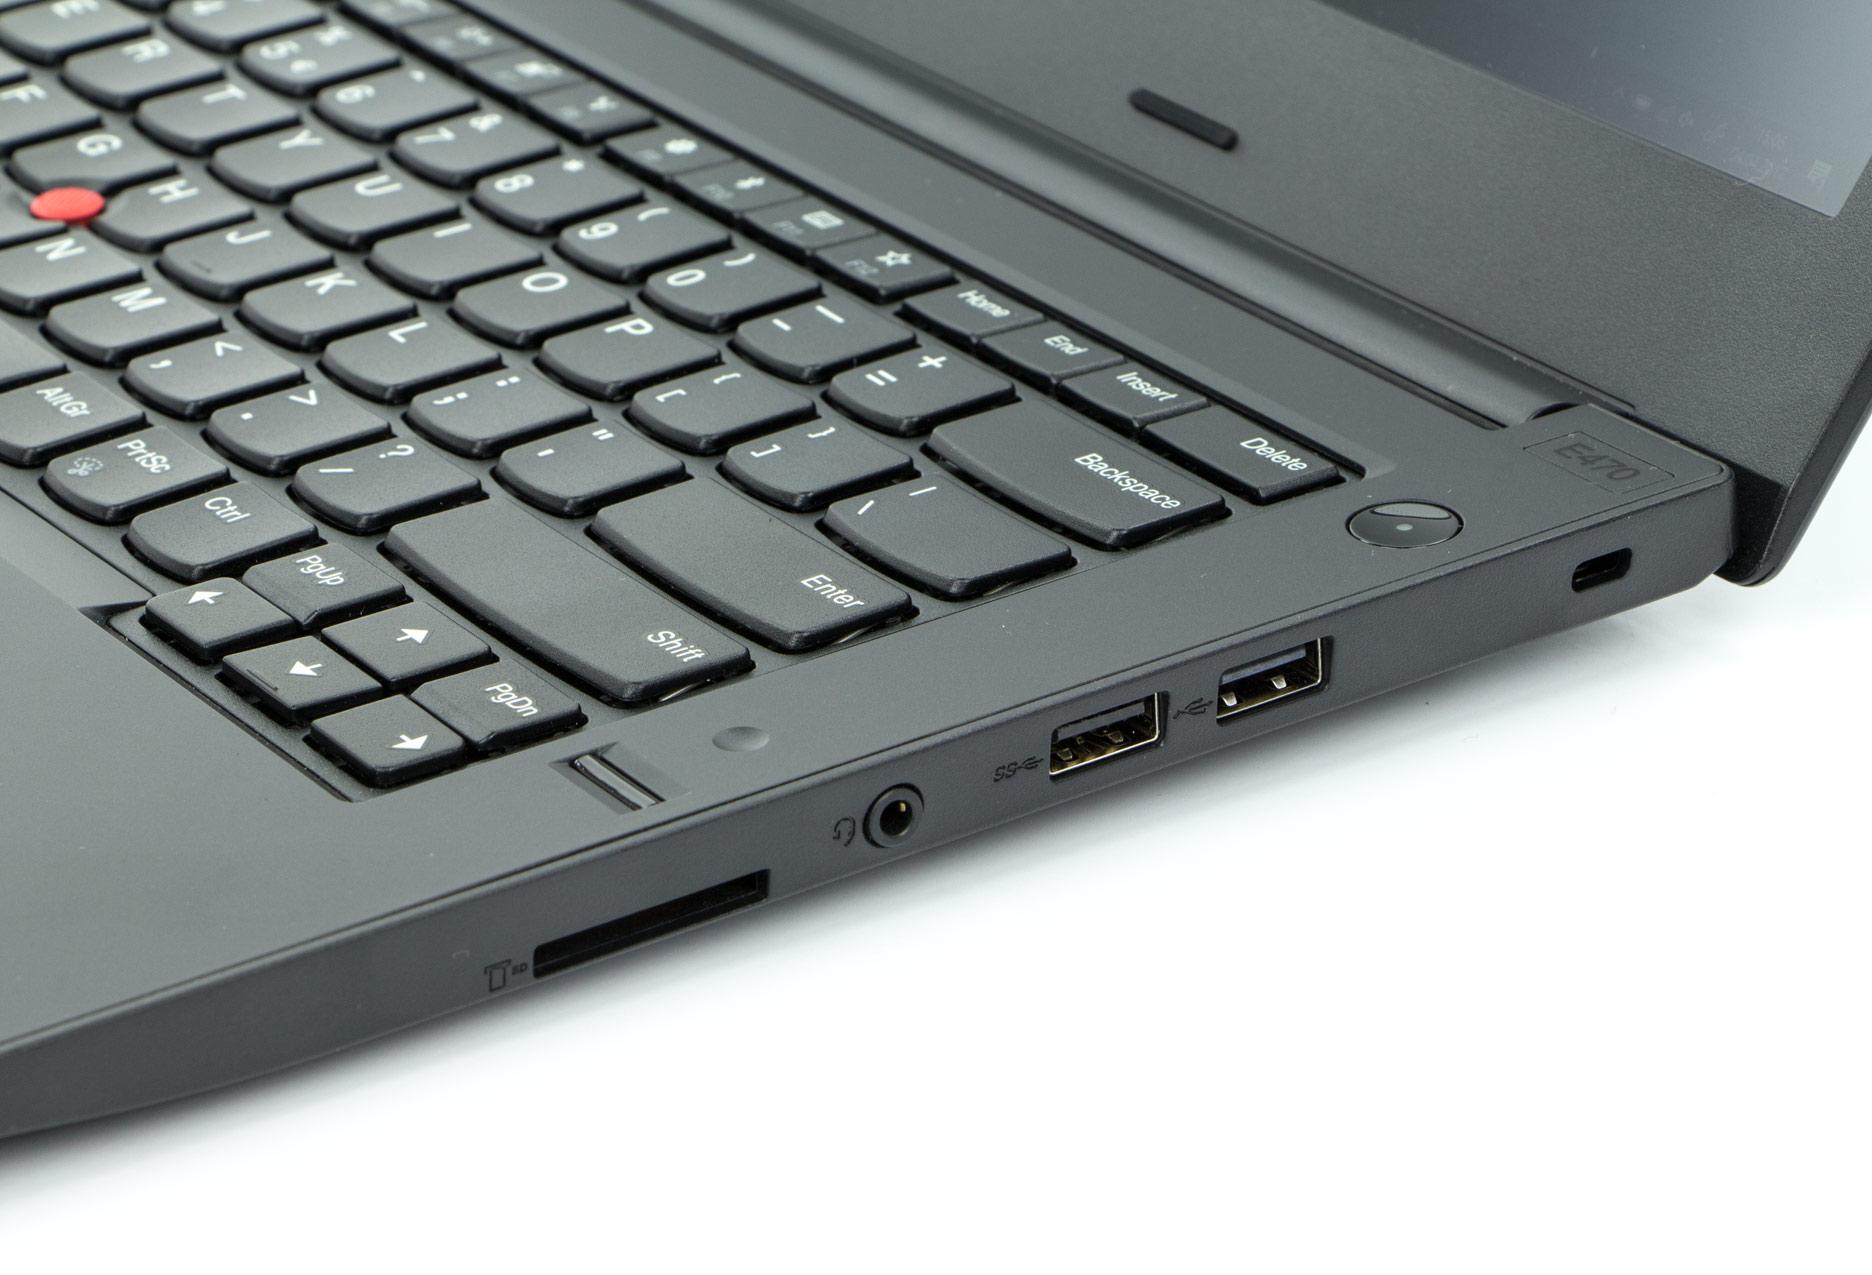 Lenovo ThinkPad E470 prawy bok